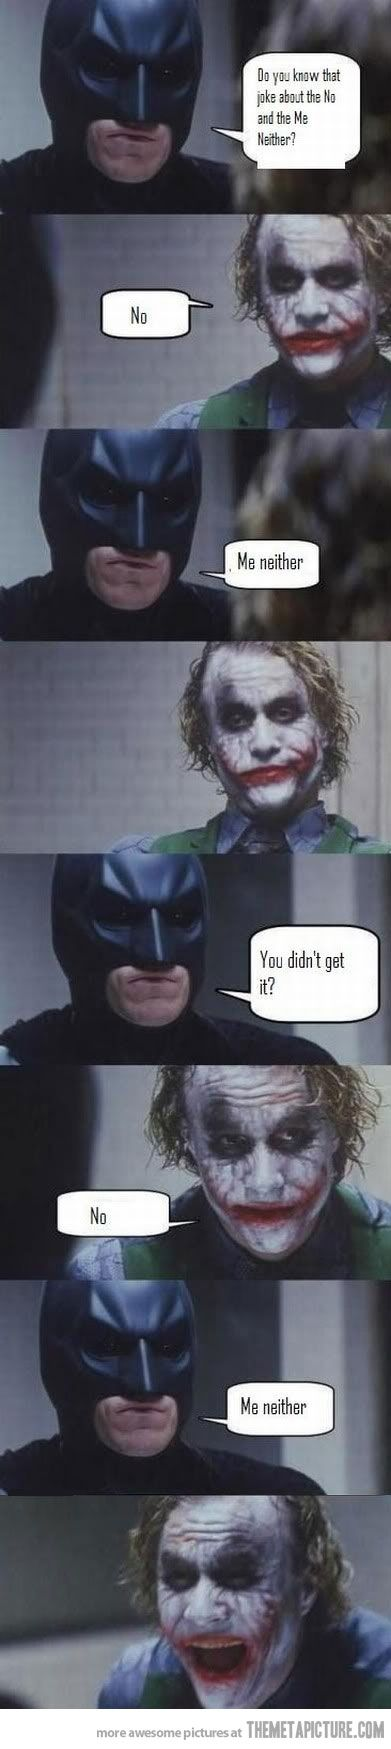 f14f428aabddc69528dba4861e33ec48 do you know that joke batman, humor and memes